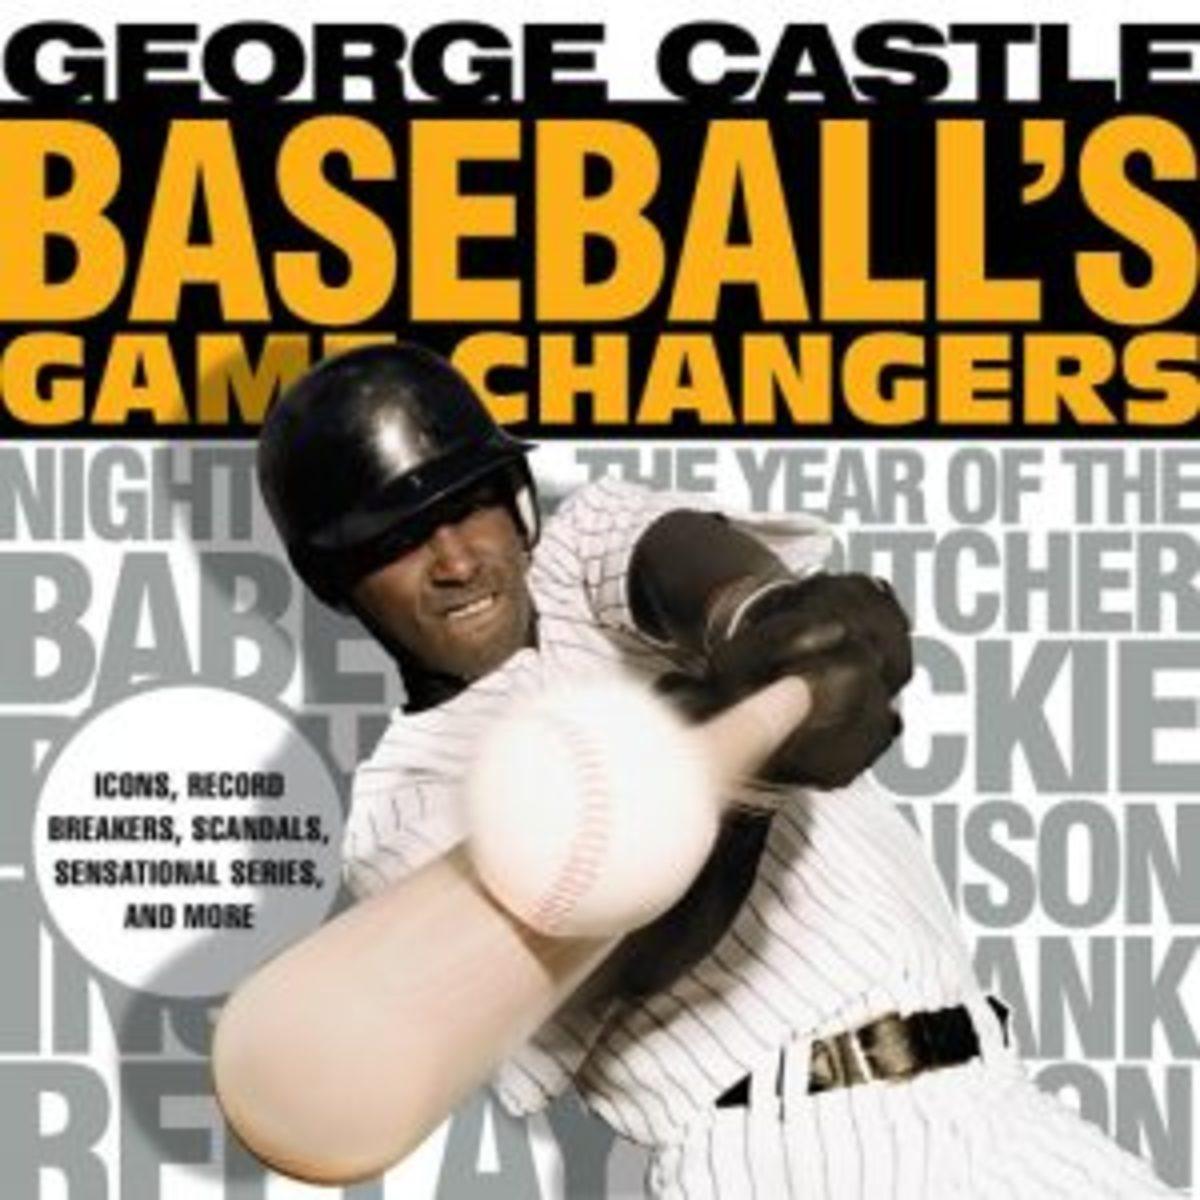 1-baseballsgamechangers-web